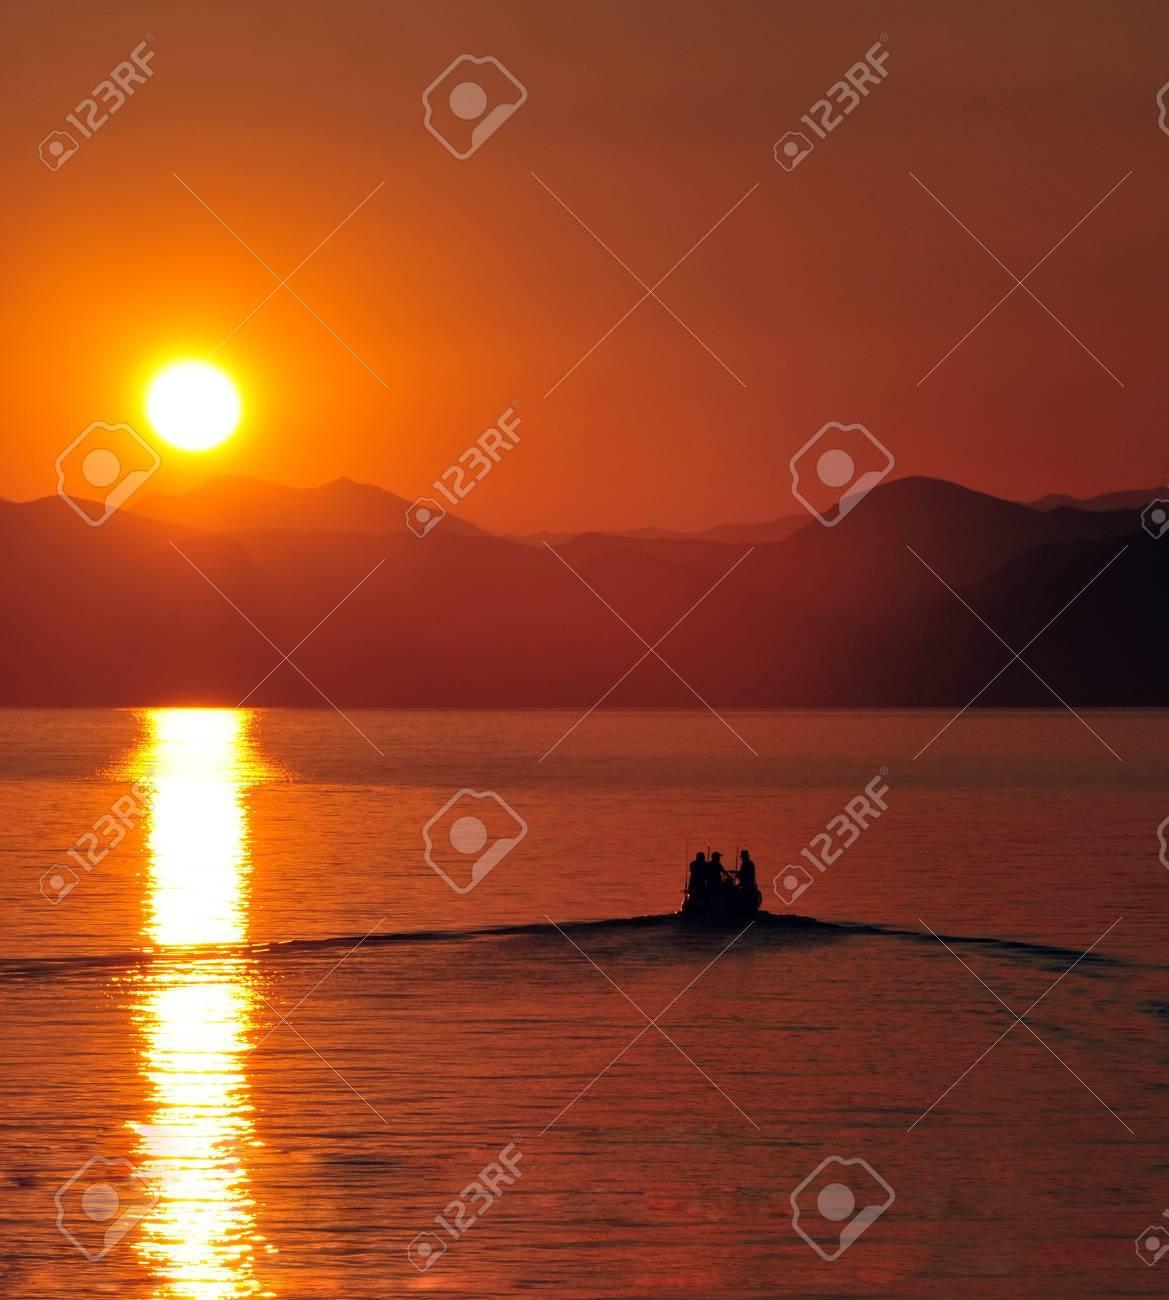 fishermen boat leaving harbour at sunset - 32754211